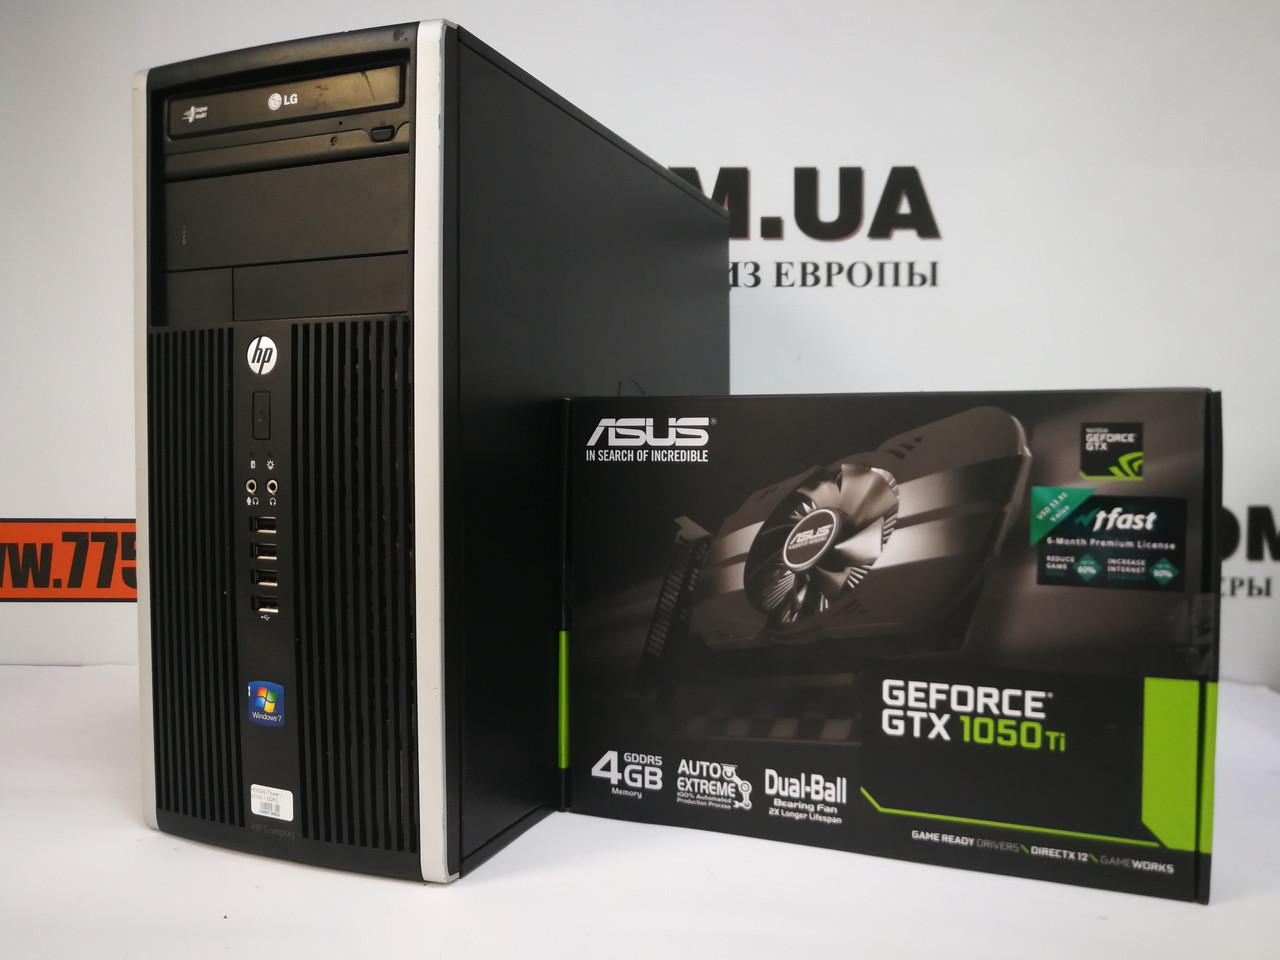 Игровой компьютер HP 6200, Intel Core i5-2500 3.7GHz, RAM 8ГБ, SSD 120ГБ, HDD 500ГБ, Nvidia GTX 1050Ti 4GB New